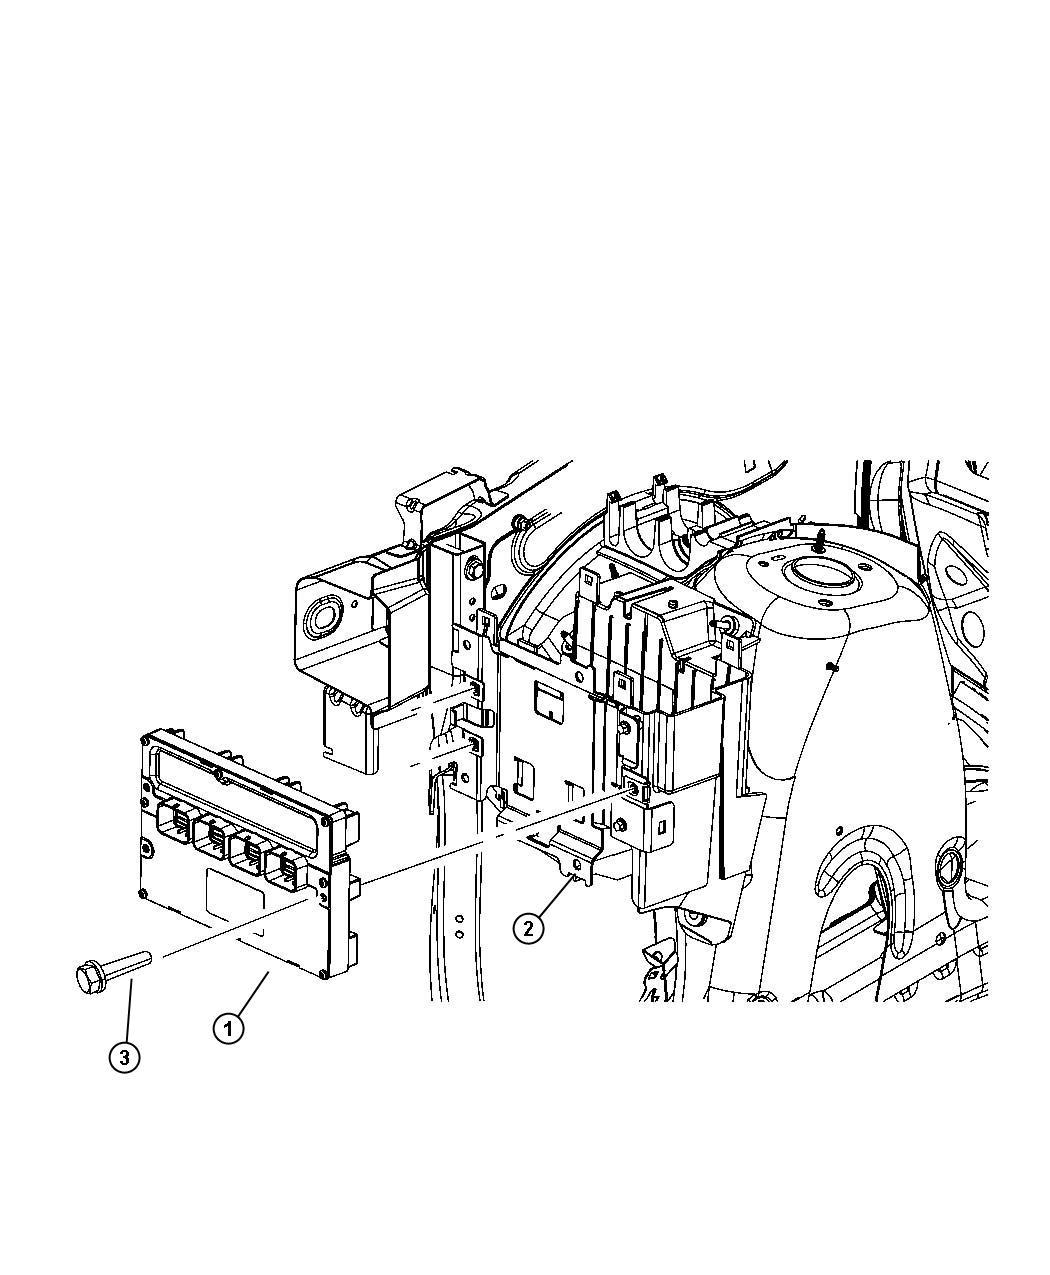 rl150582ac jeep module powertrain control engine. Black Bedroom Furniture Sets. Home Design Ideas